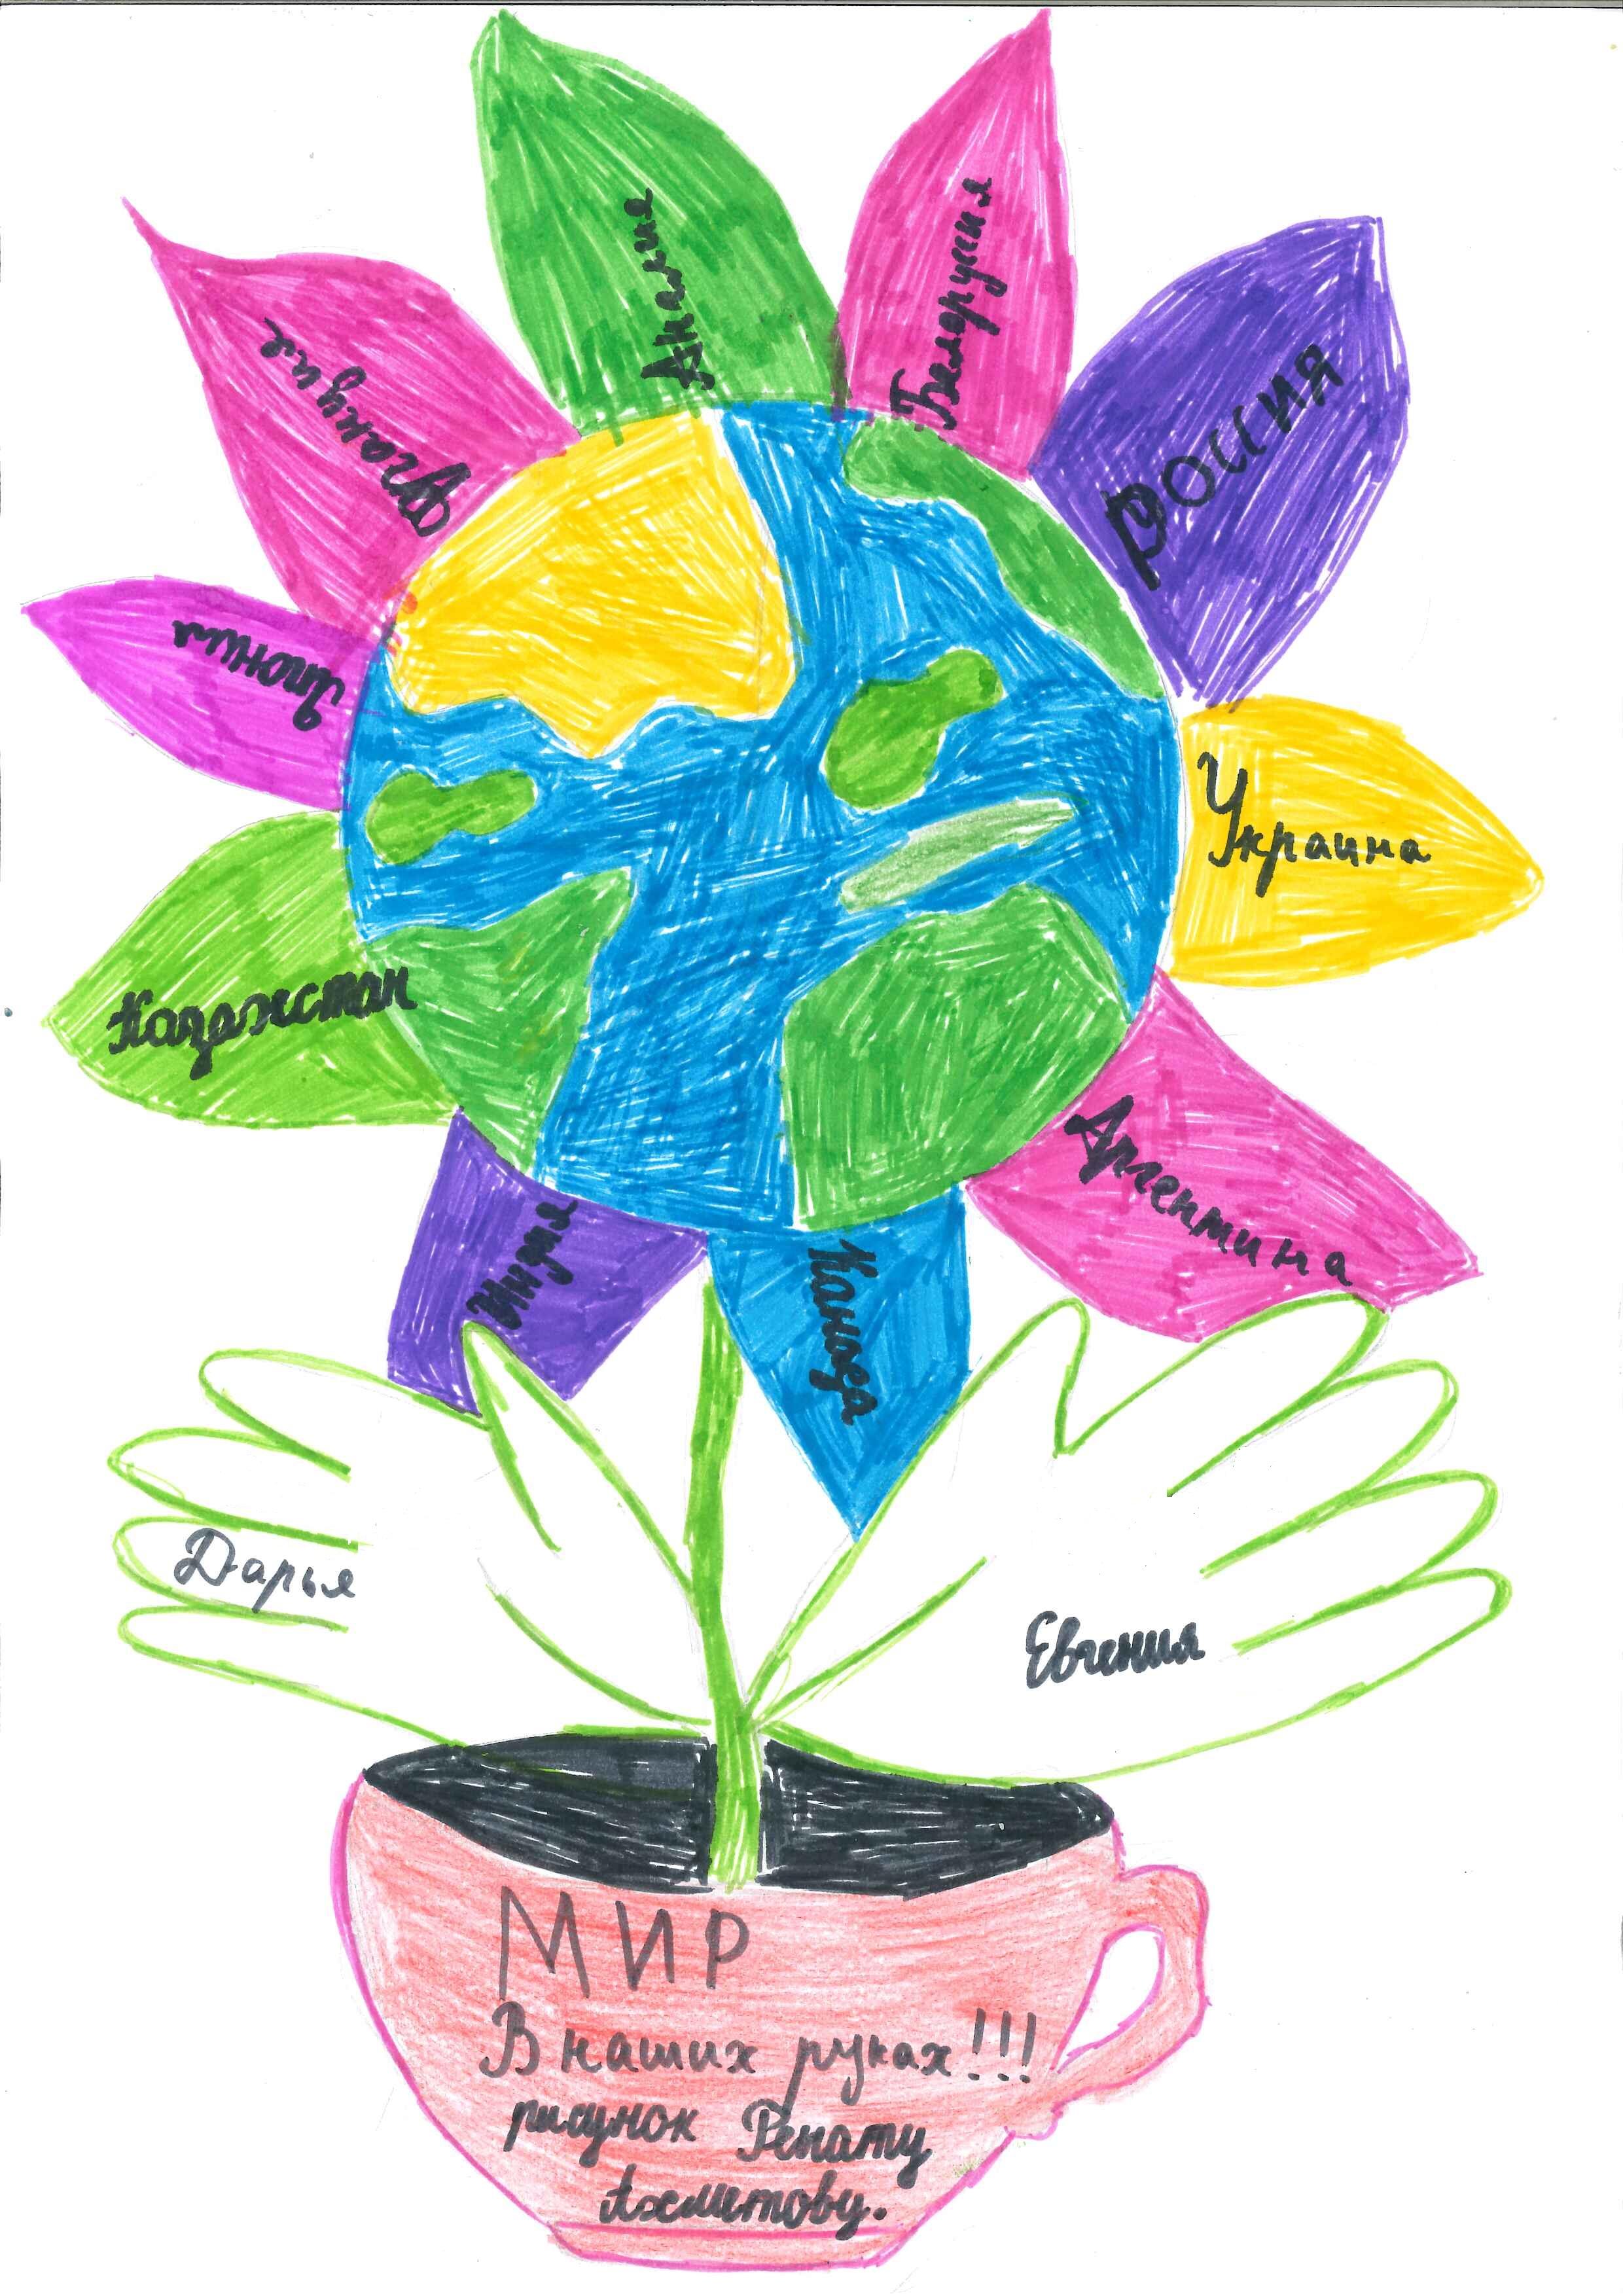 Картинки Мир за мир во всем мире   подборка фото (13)